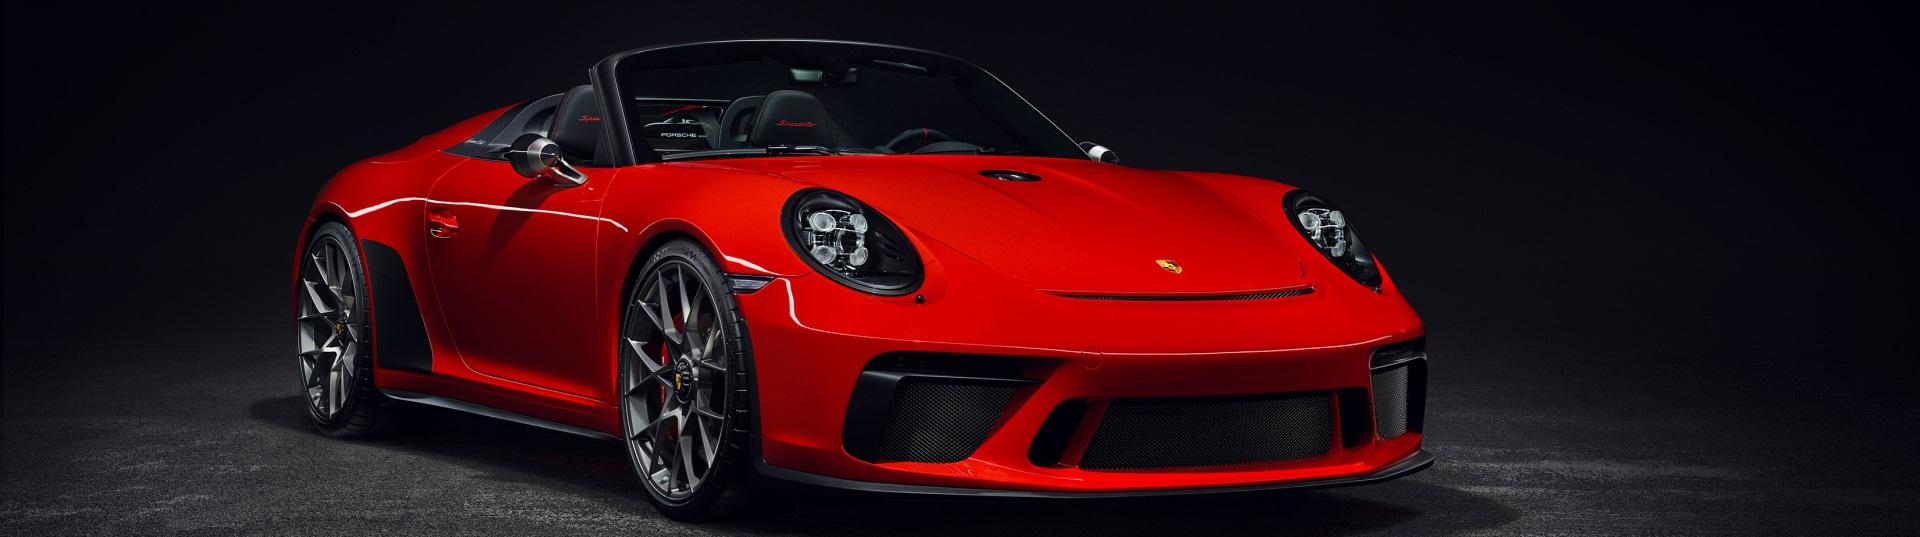 911 speedster_1920